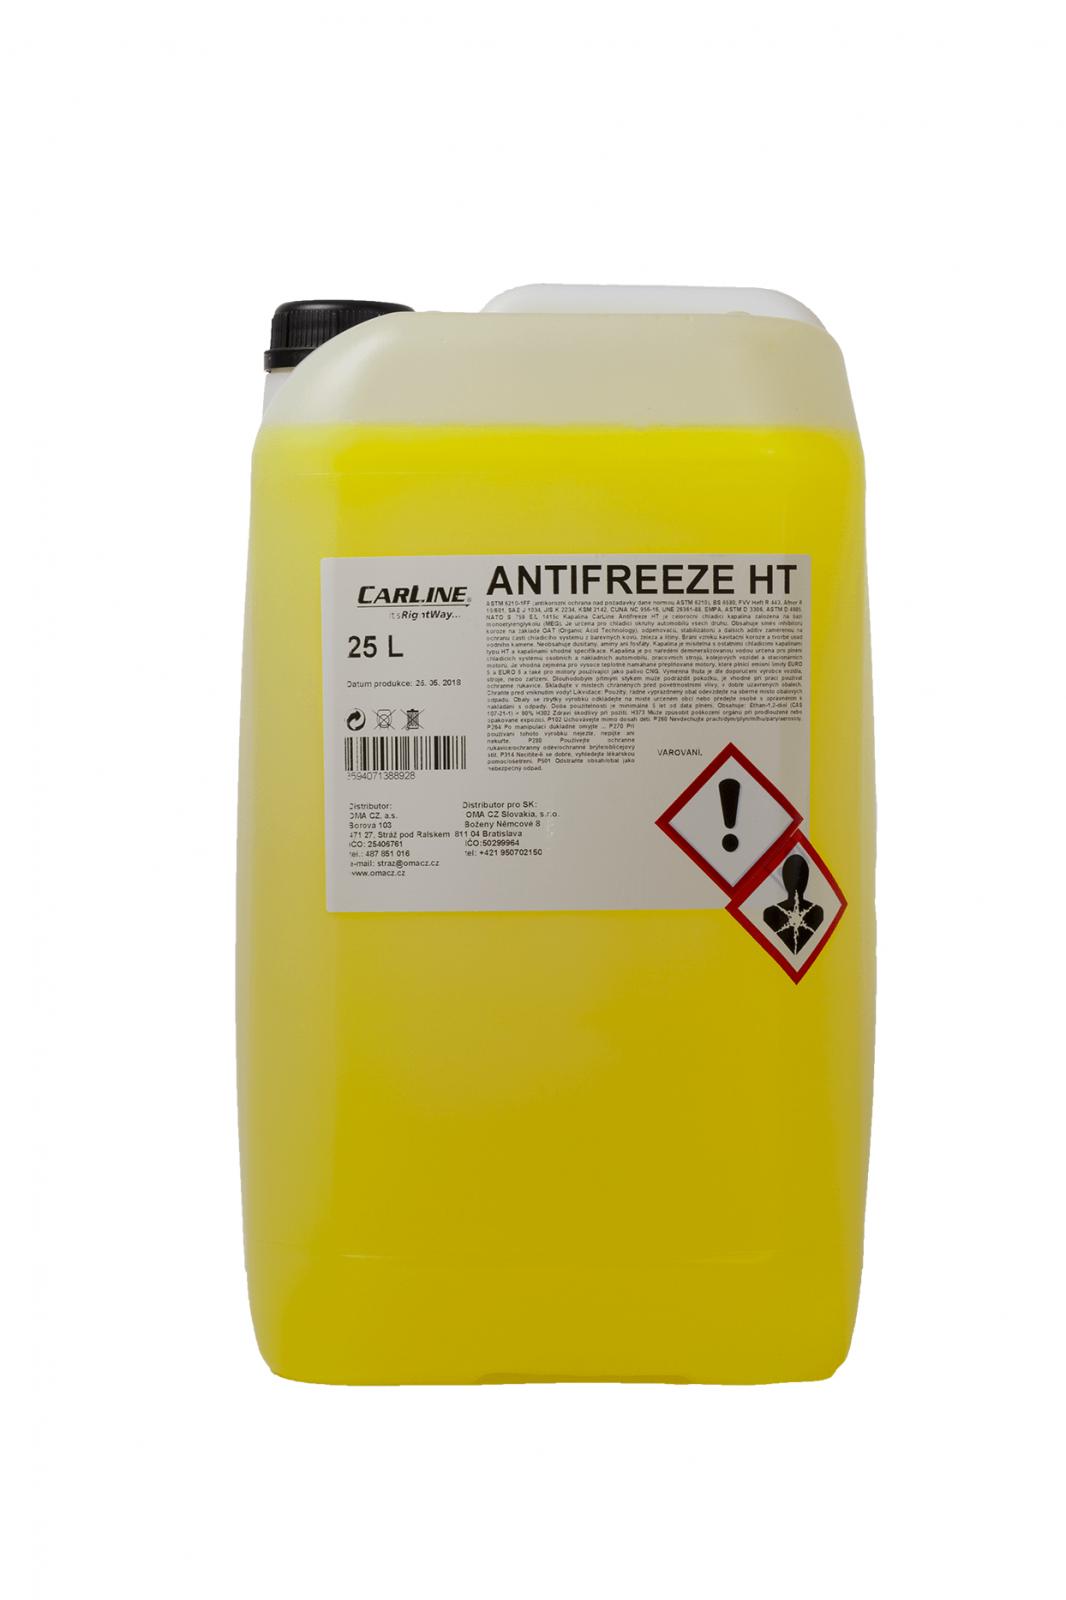 Carline Antifreeze HT 25 L